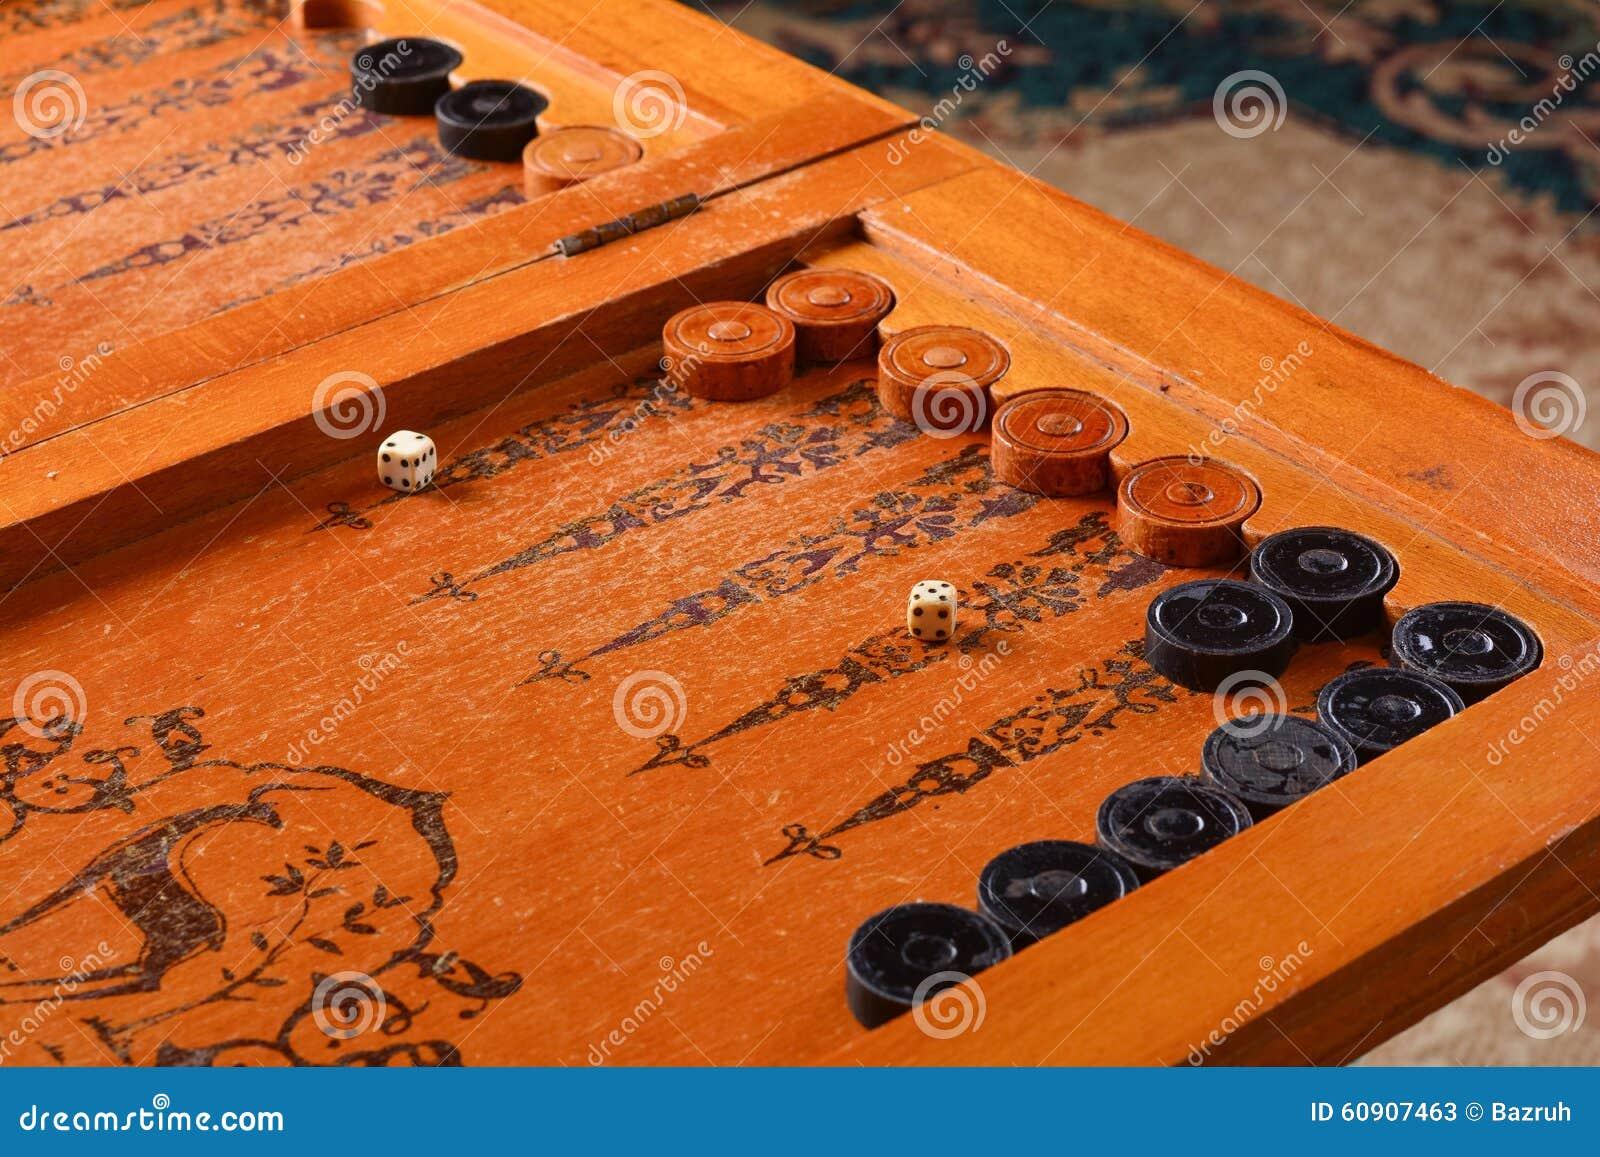 Vintage Board Game Backgammon Stock Photo Image 60907463